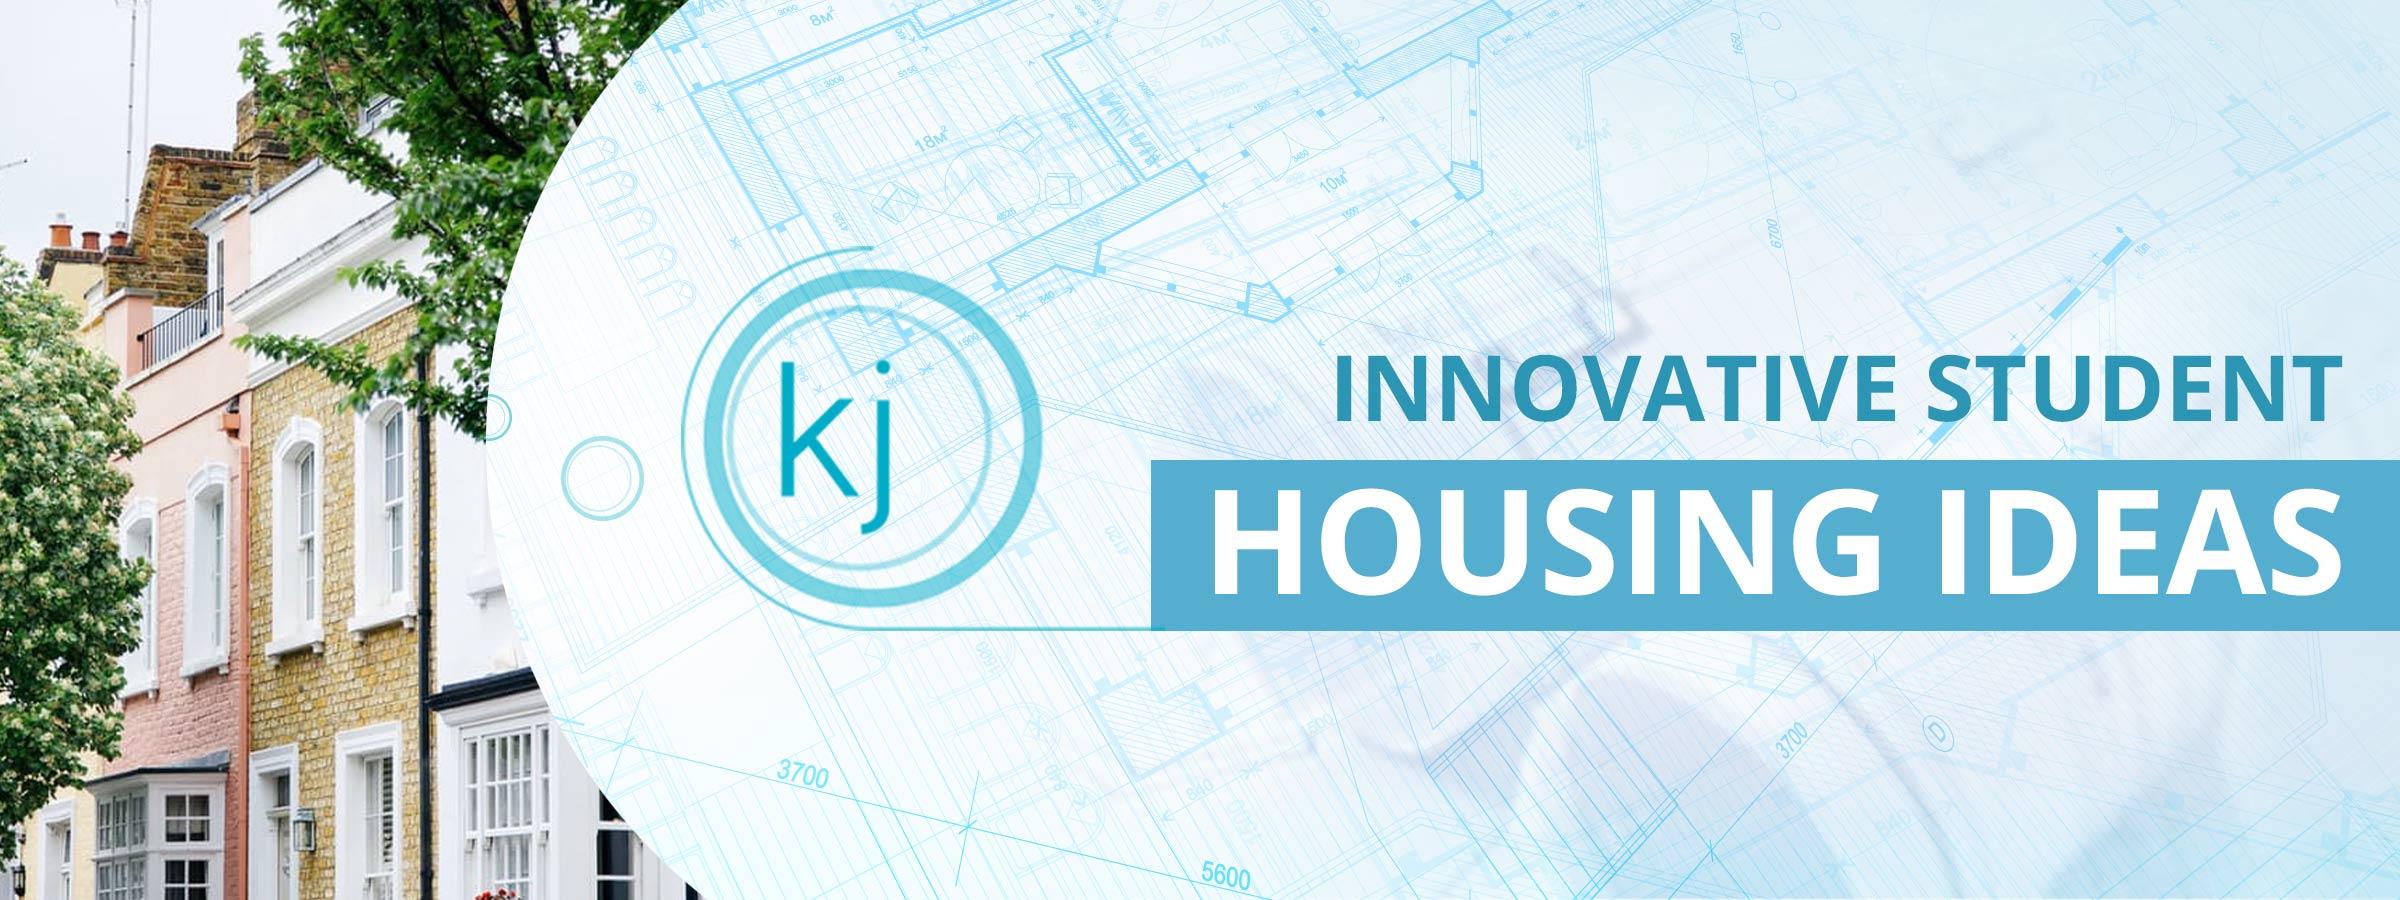 Innovative student housing ideas